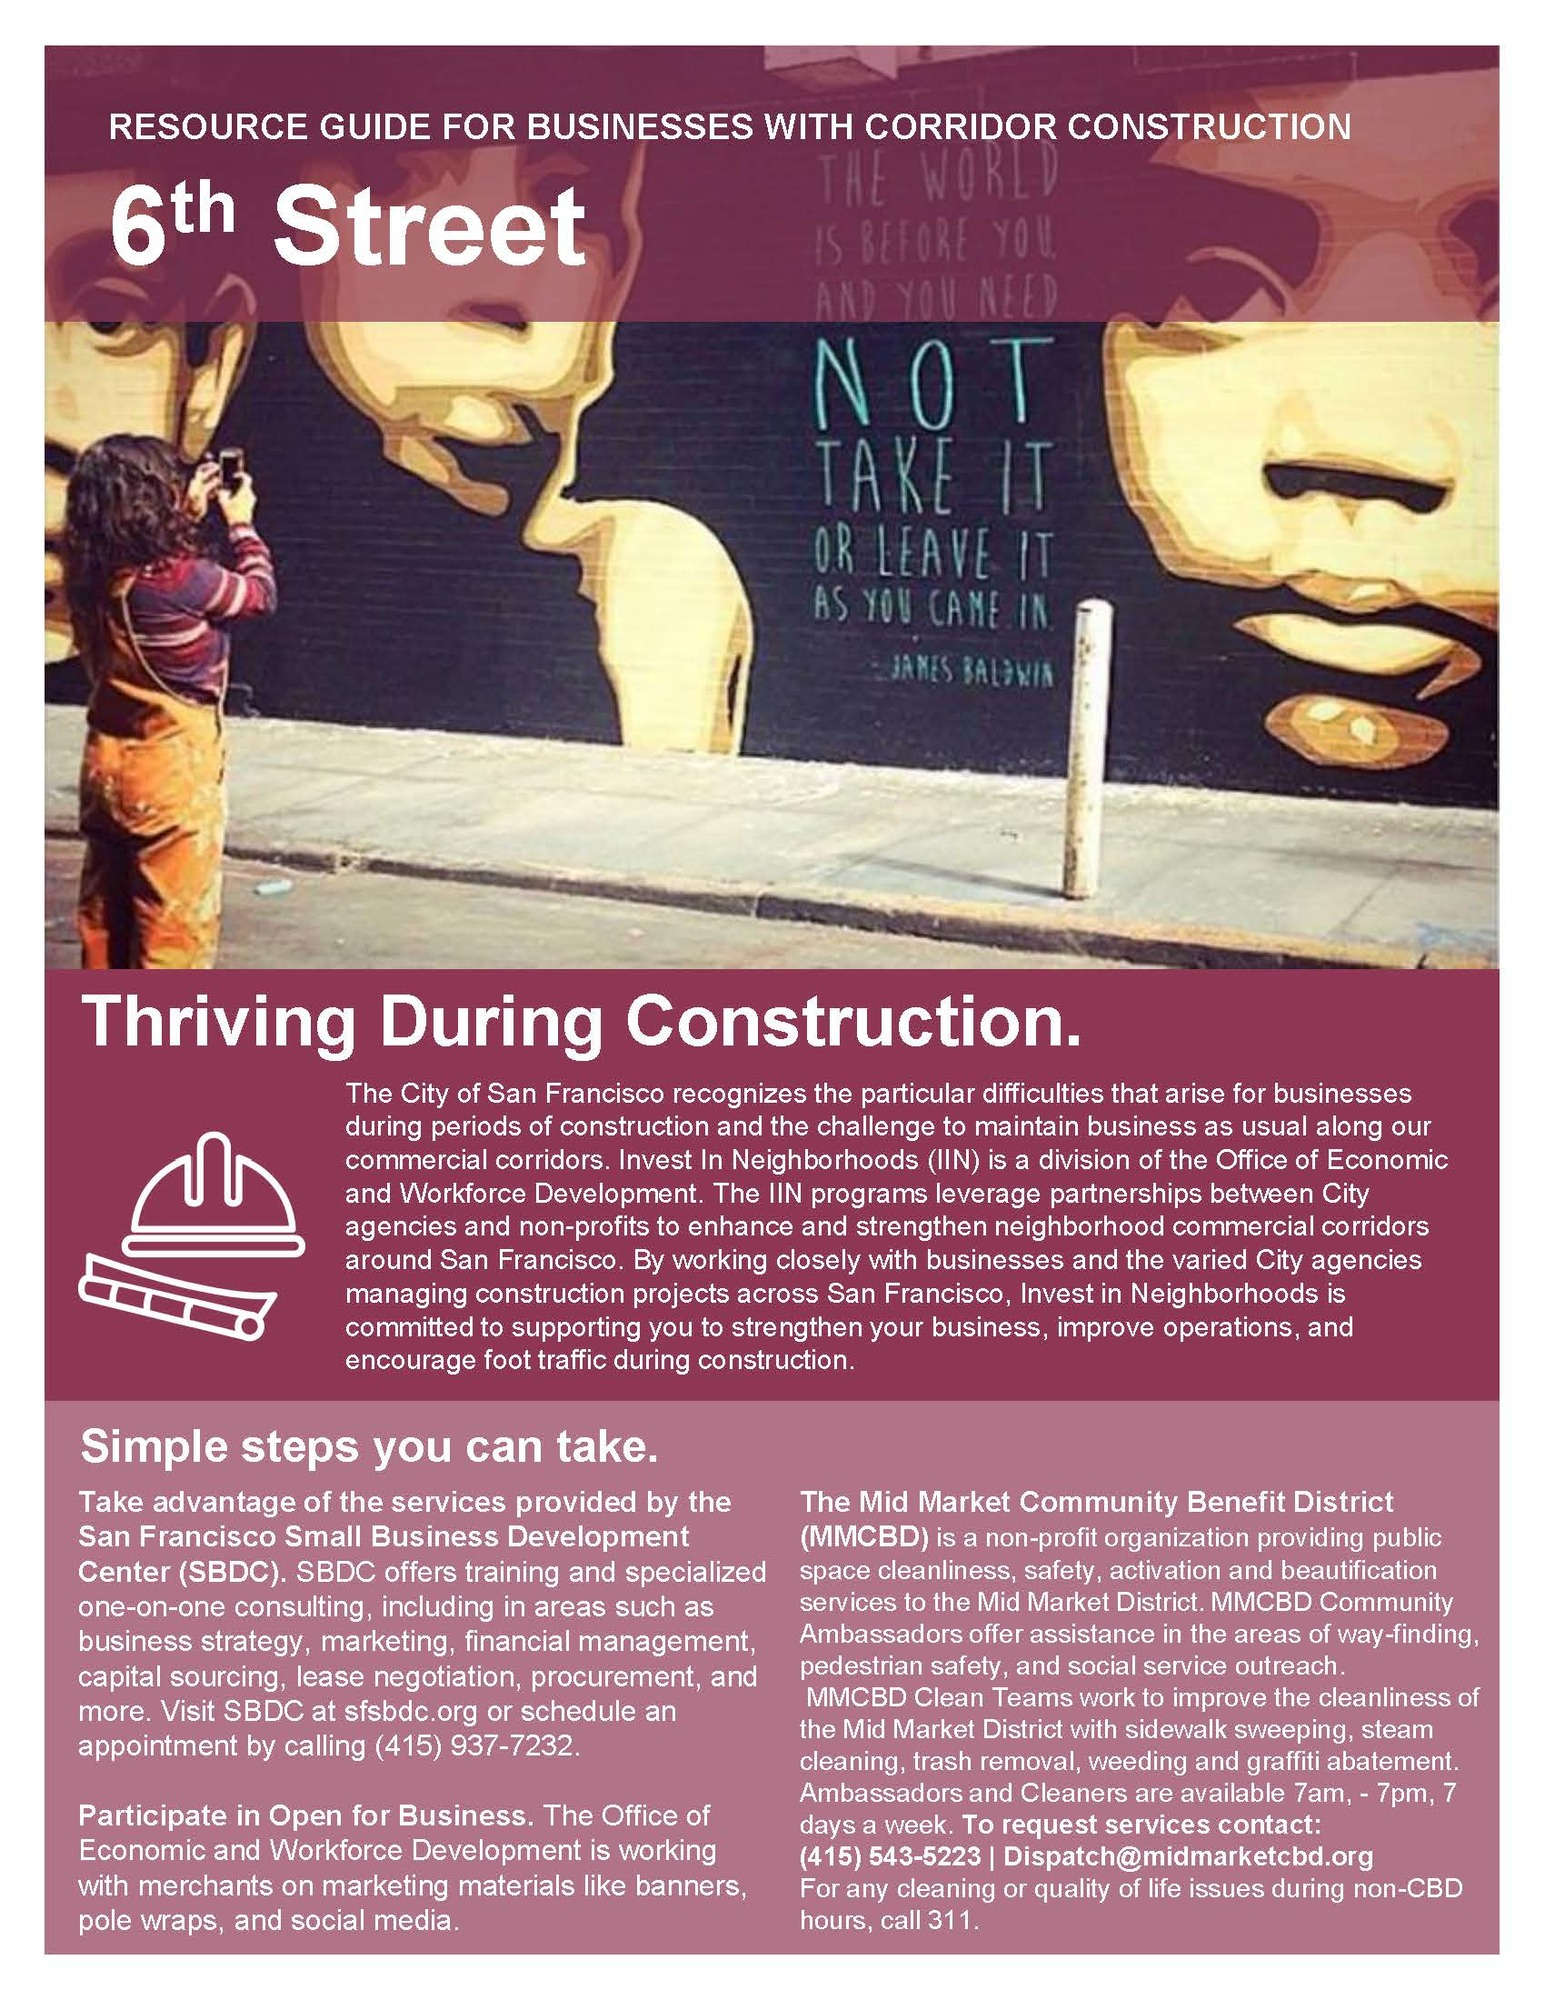 6th Street Construction Mitigation information 1